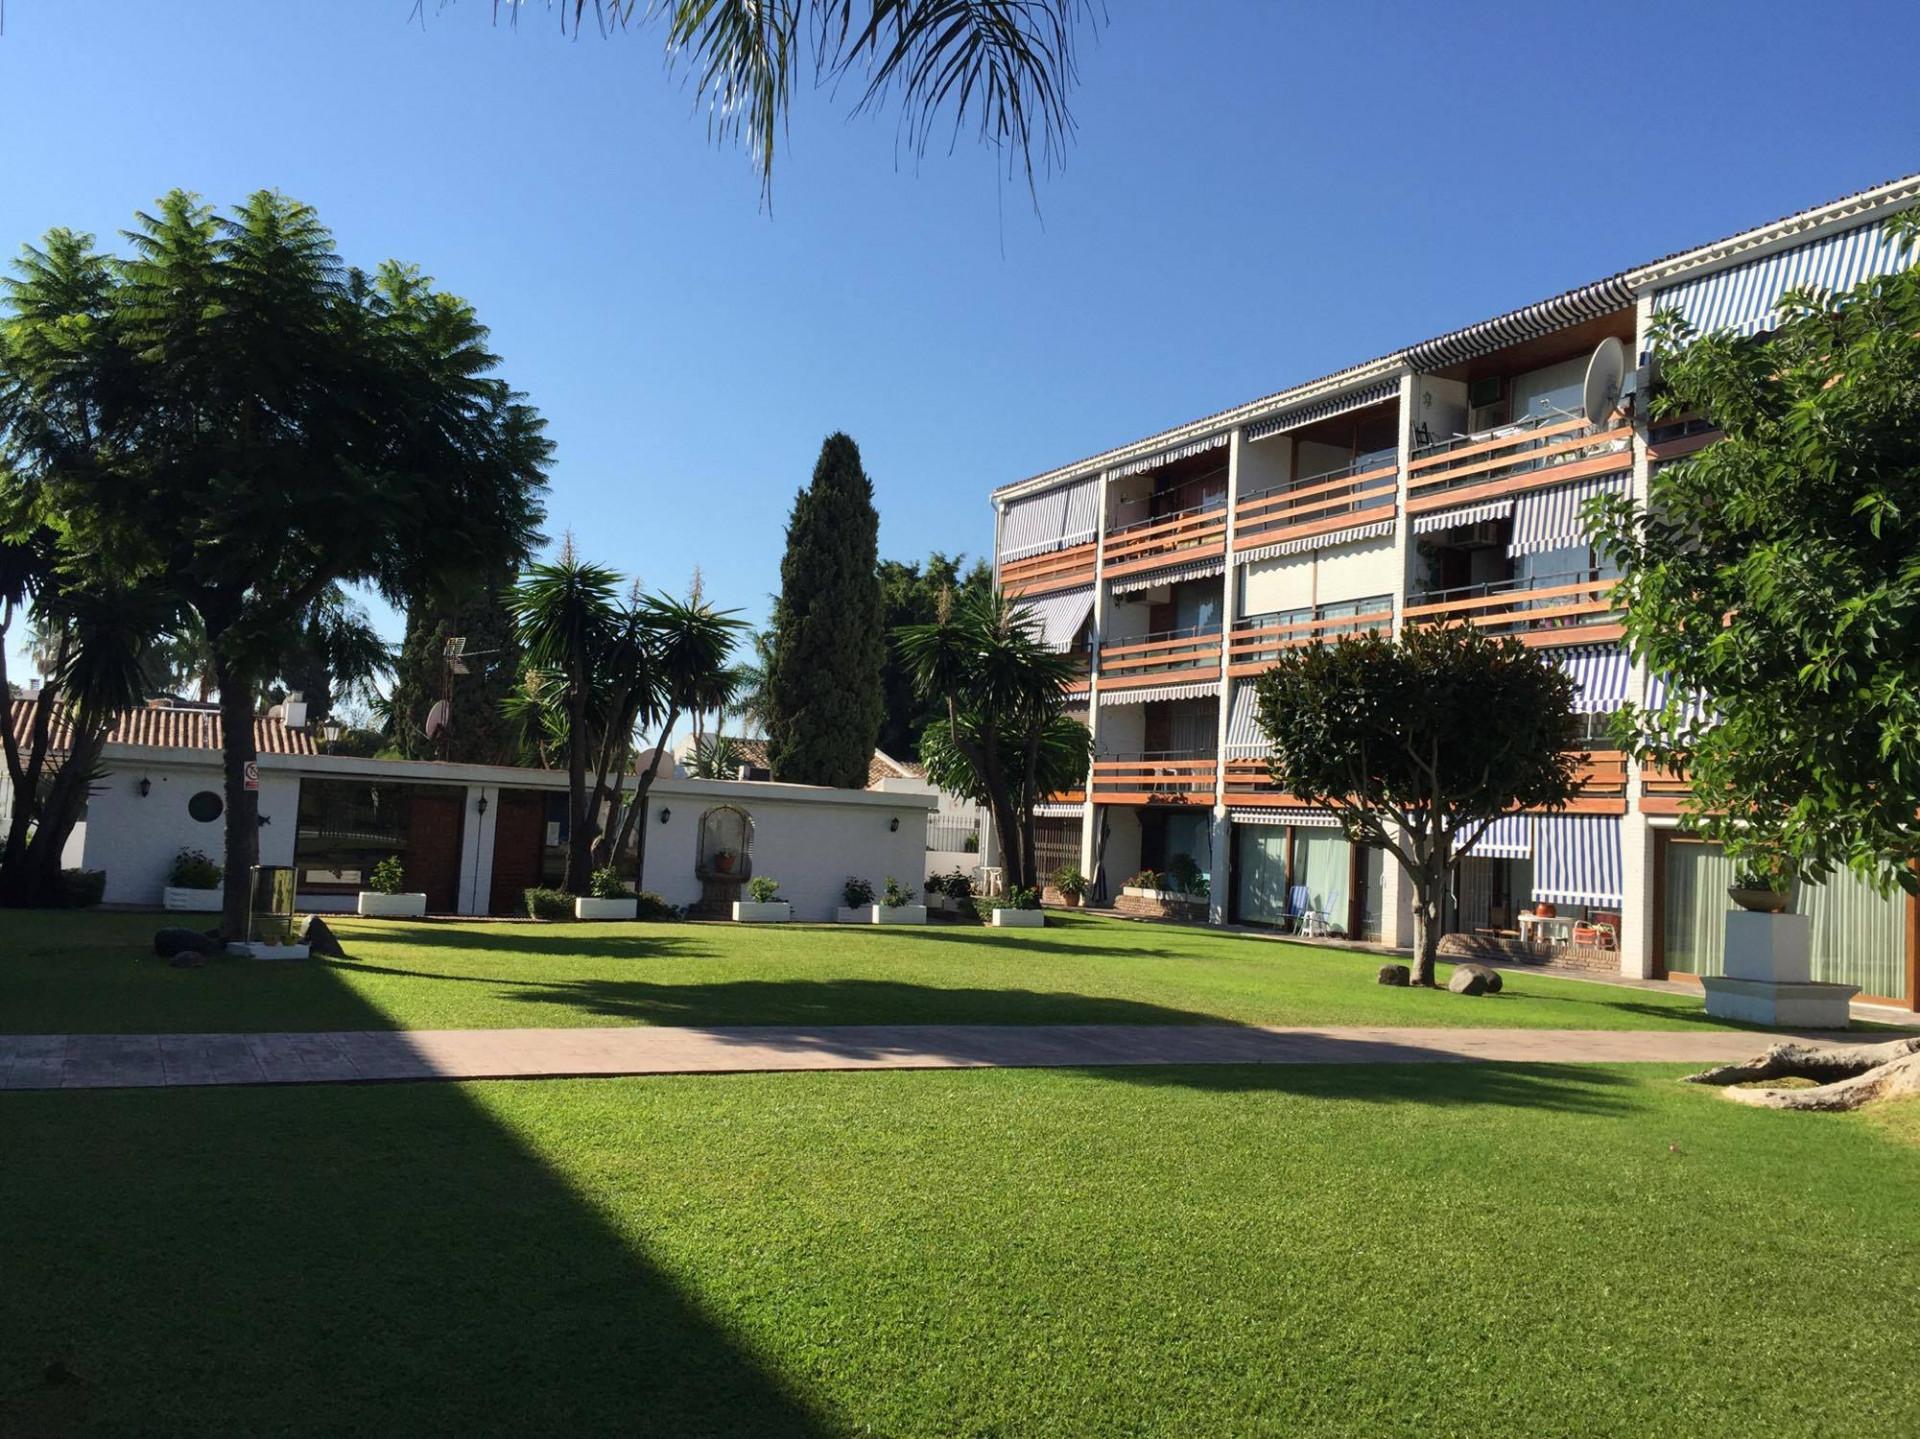 Apartments for sale in Cortijo Blanco